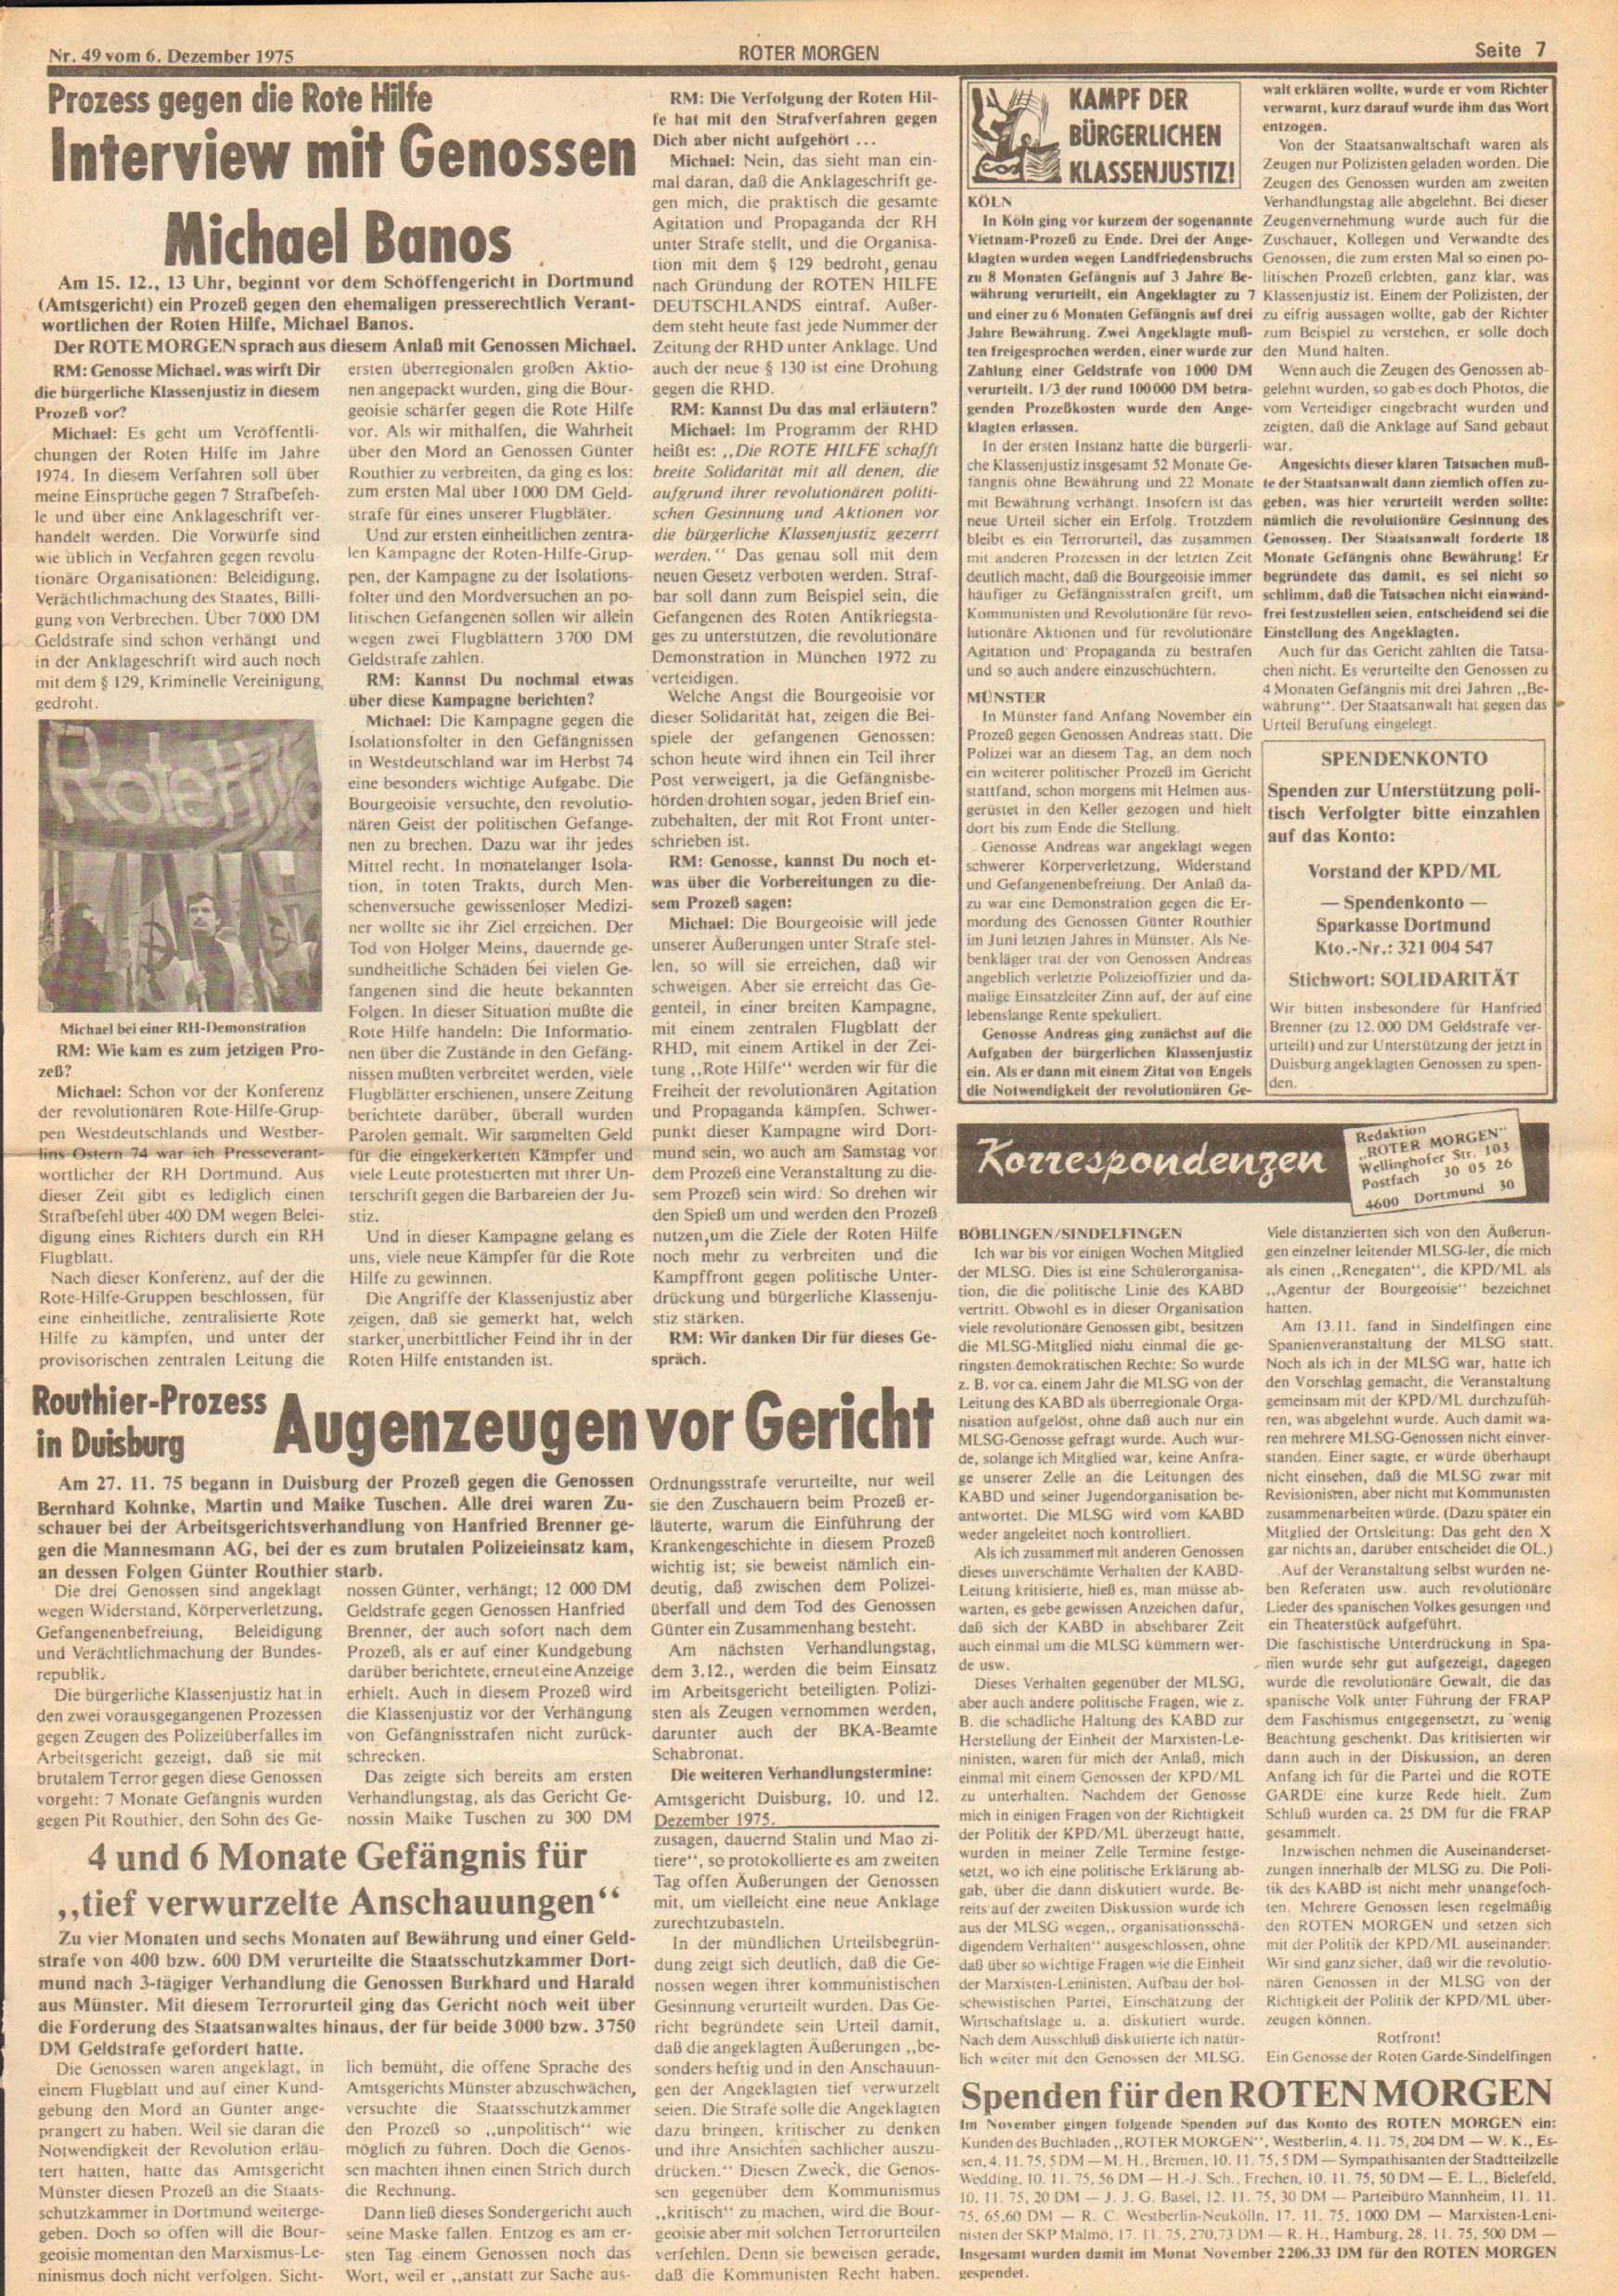 Roter Morgen, 9. Jg., 6. Dezember 1975, Nr. 49, Seite 7